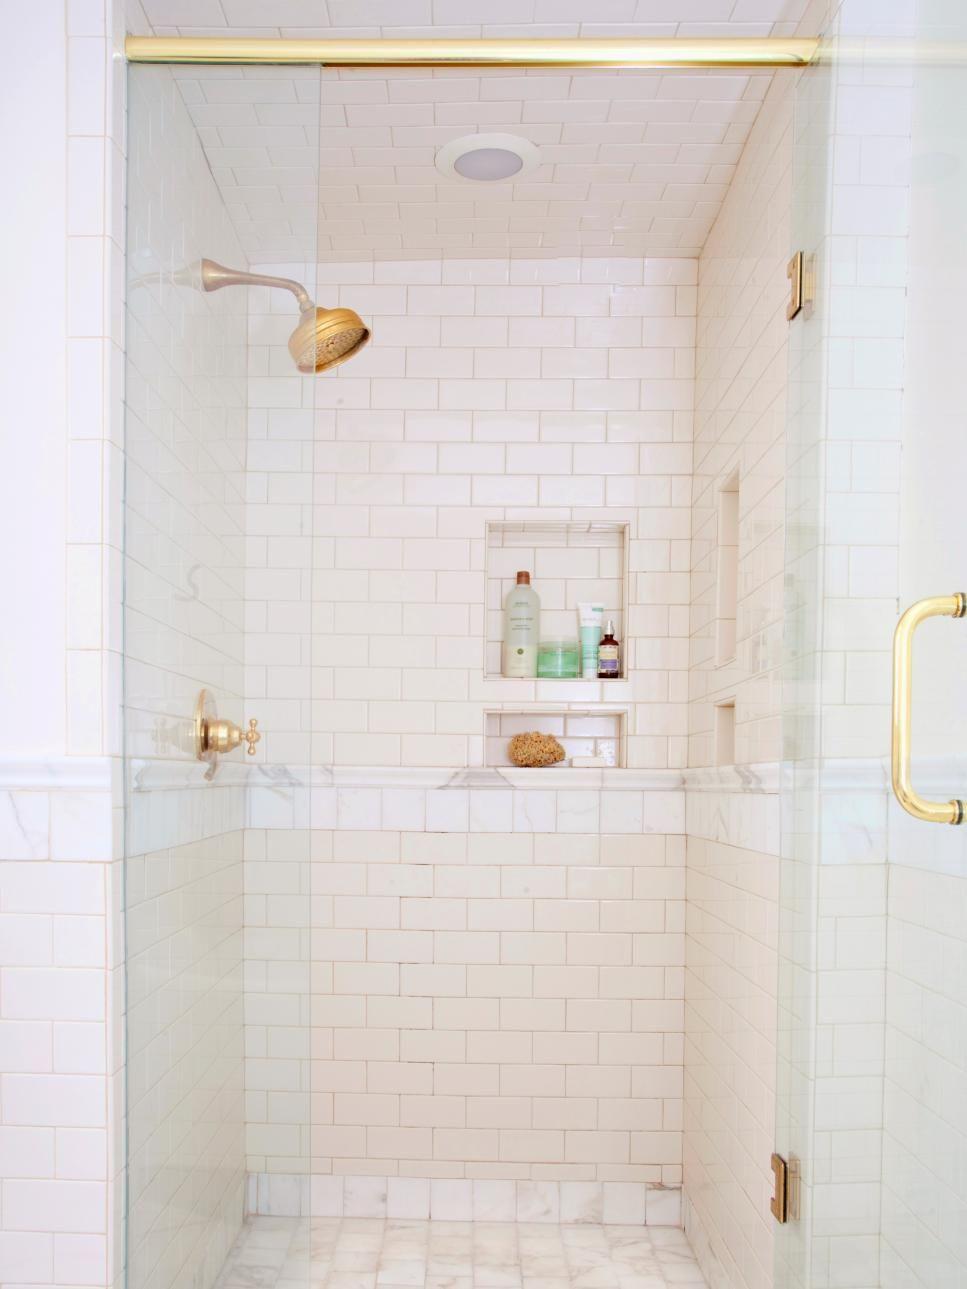 Bathroom Shower Designs | Pinterest | Showers, Luxury and Hgtv